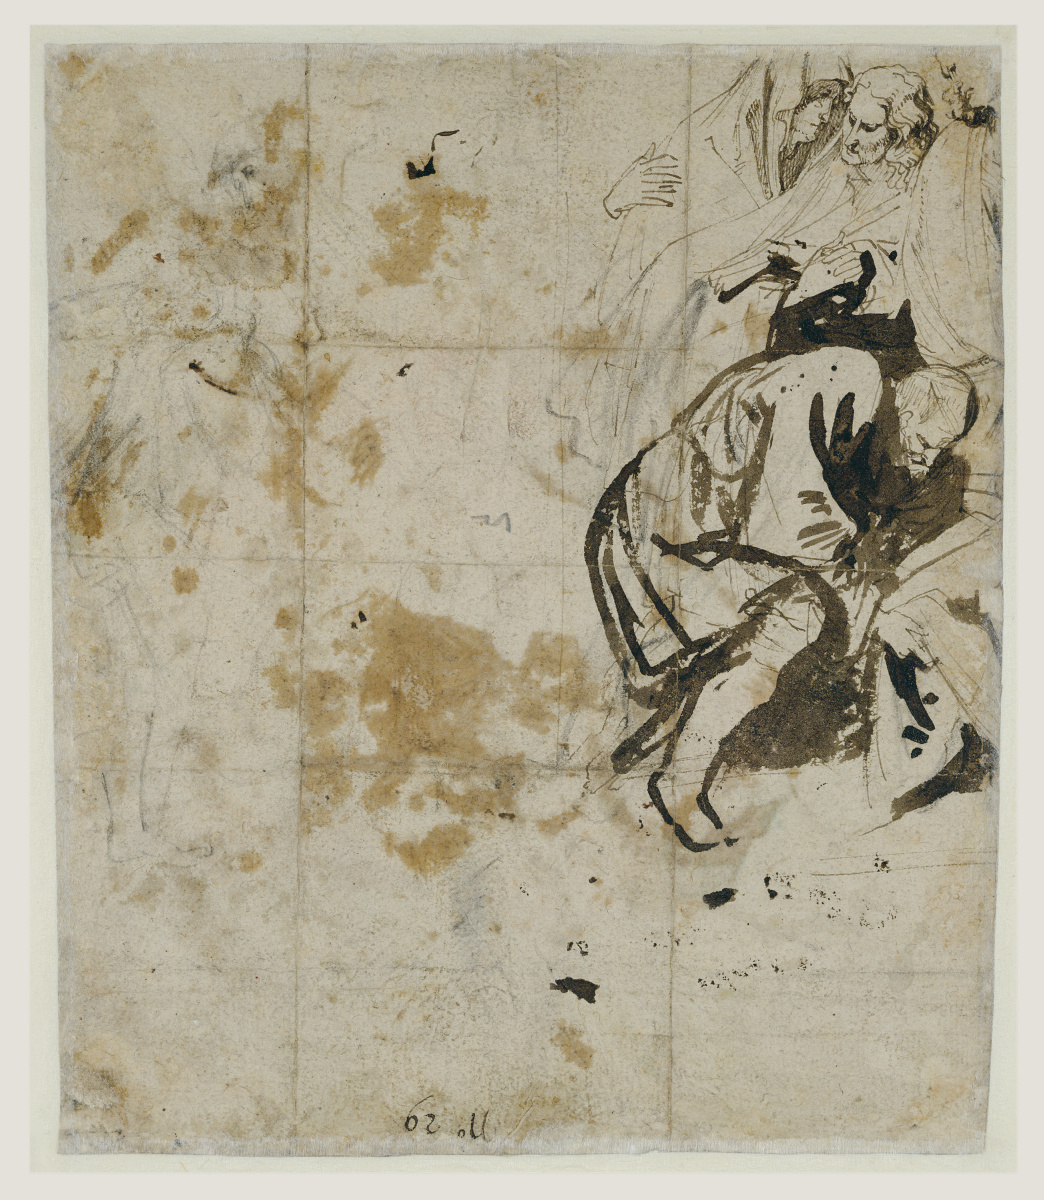 Anthony van Dyck. Burial (reverse side)